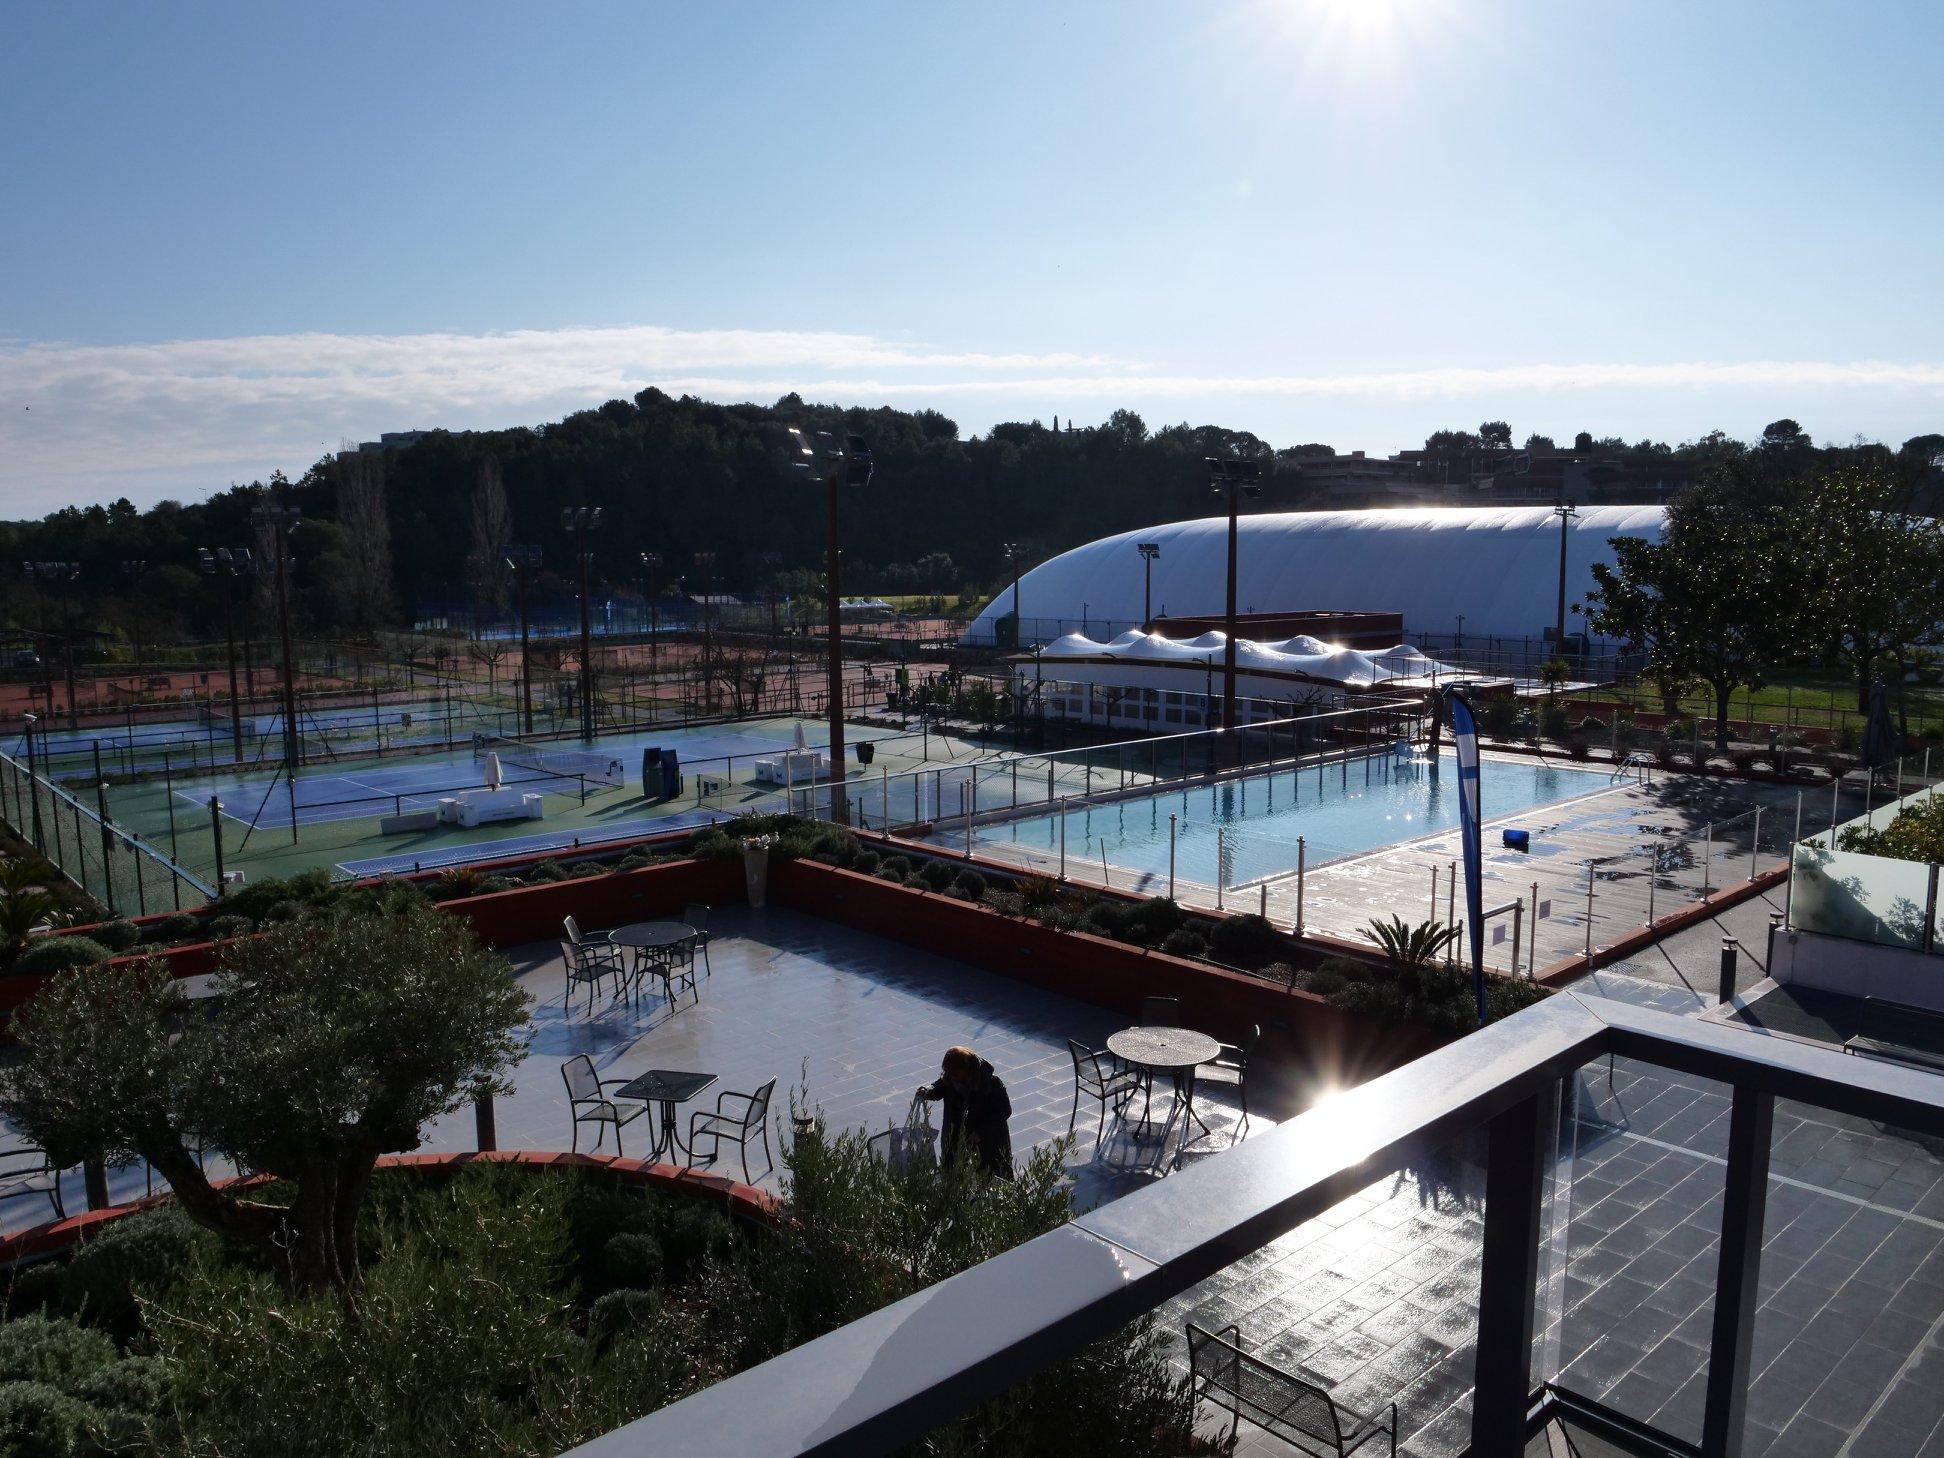 La Padelpro Cup / Tennispro Cup prévoit 2000 inscrits !